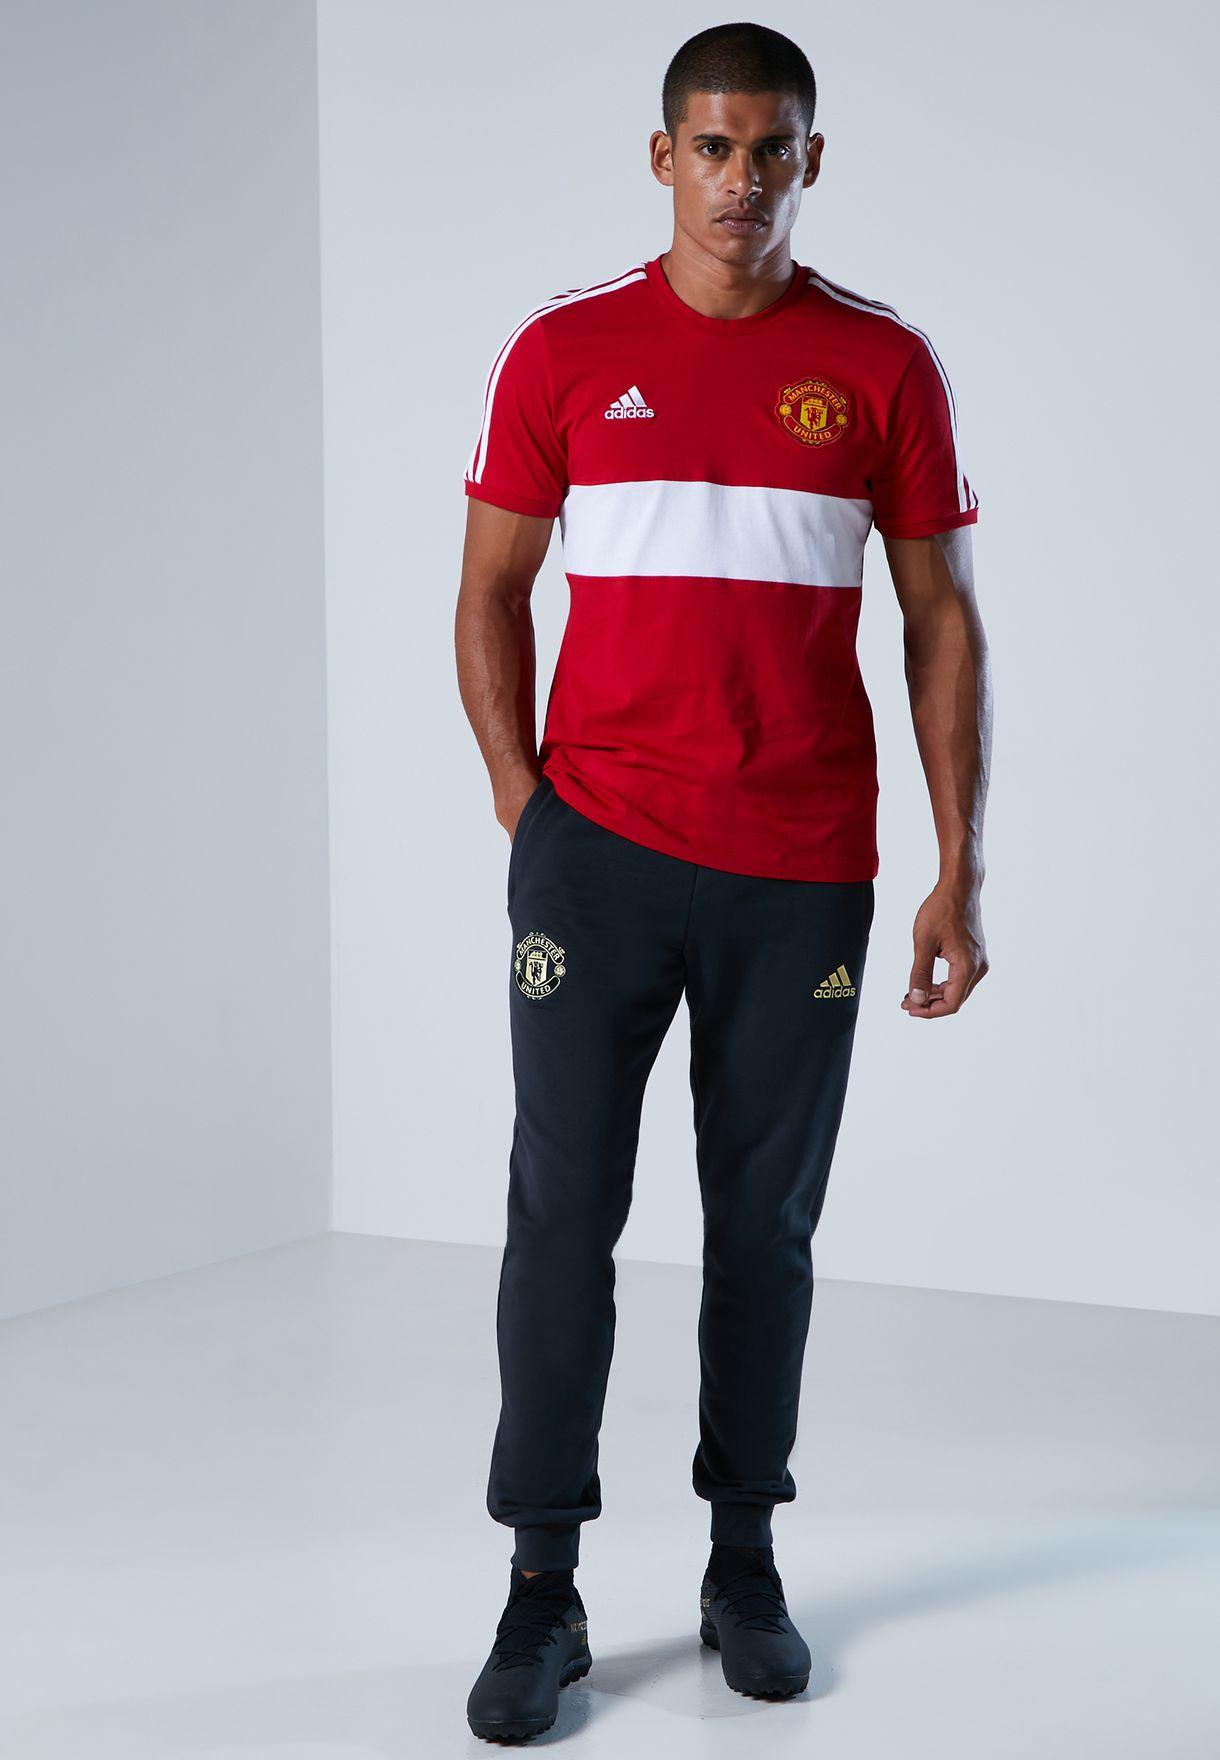 Manchester United 3 Stripe T-Shirt